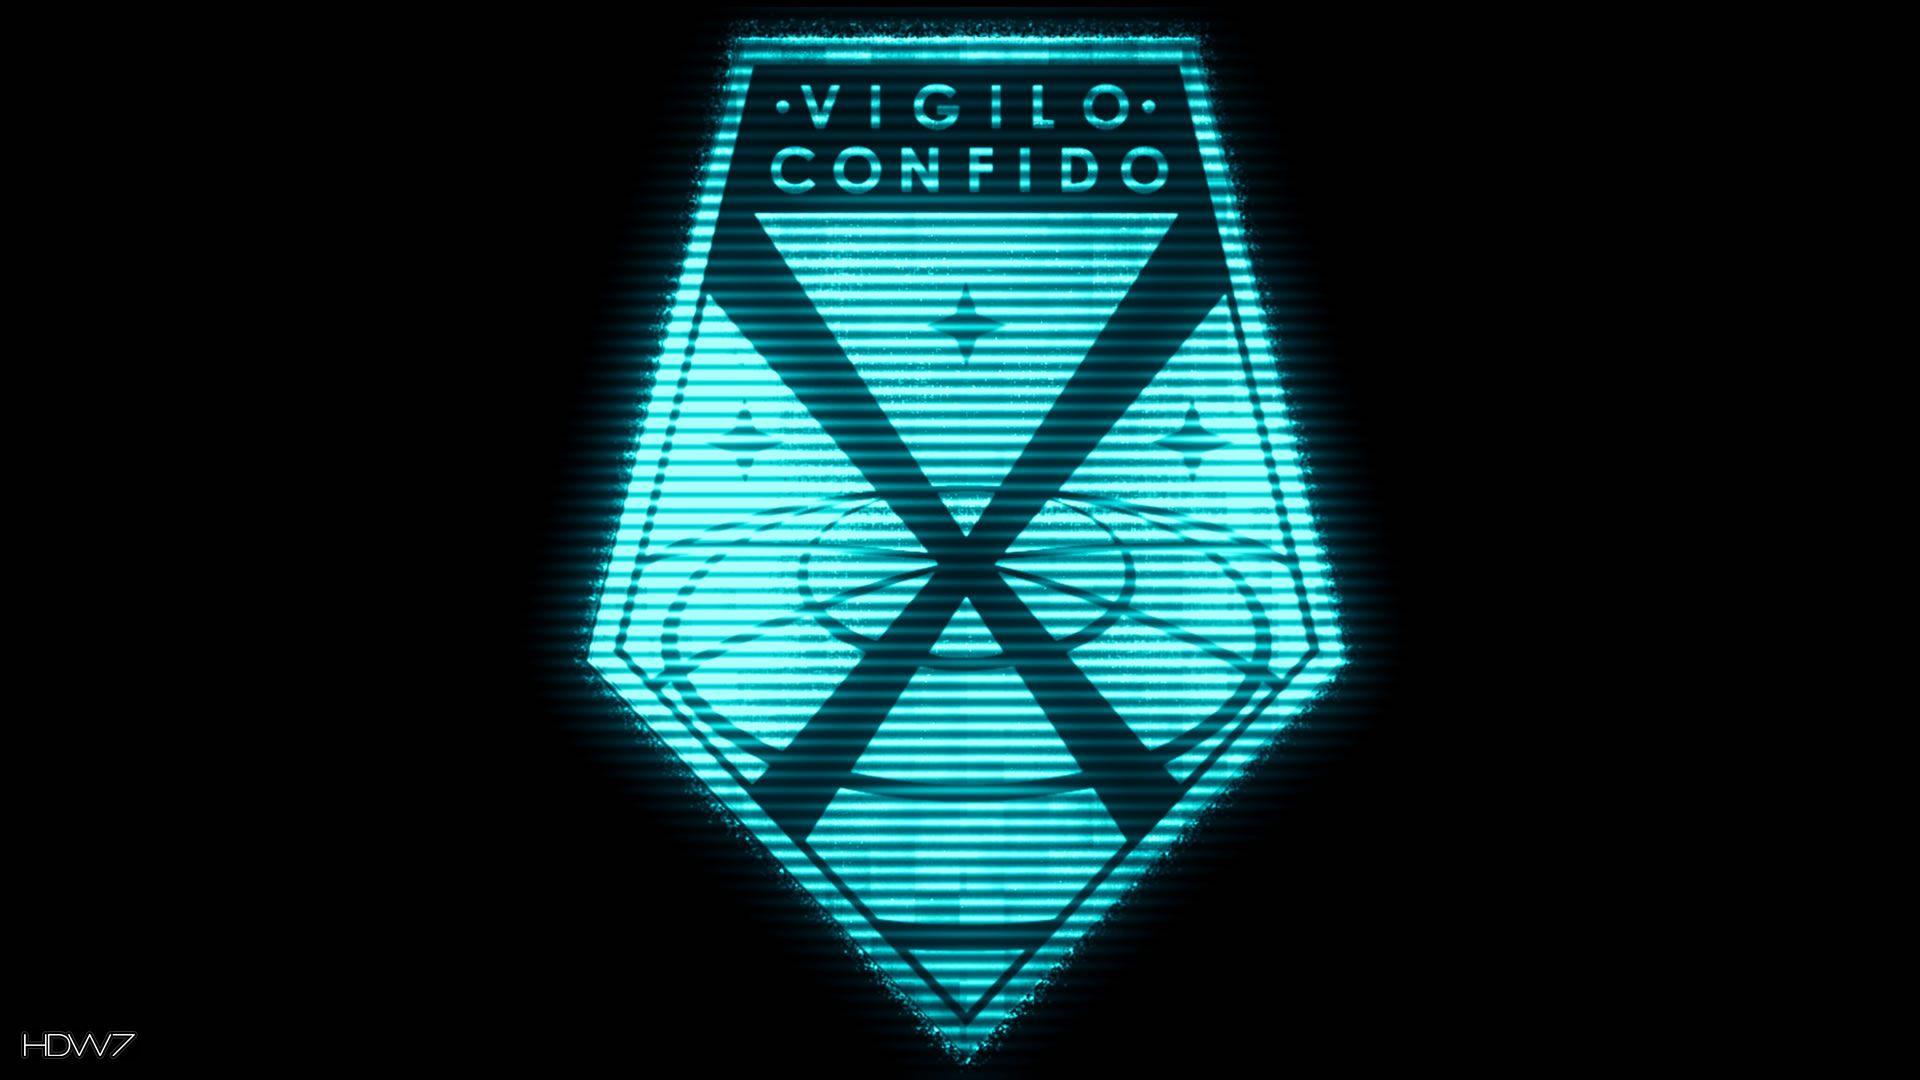 xcom-enemy-unknown-vigilo-confido-widescreen-hd-wallpaper (1920